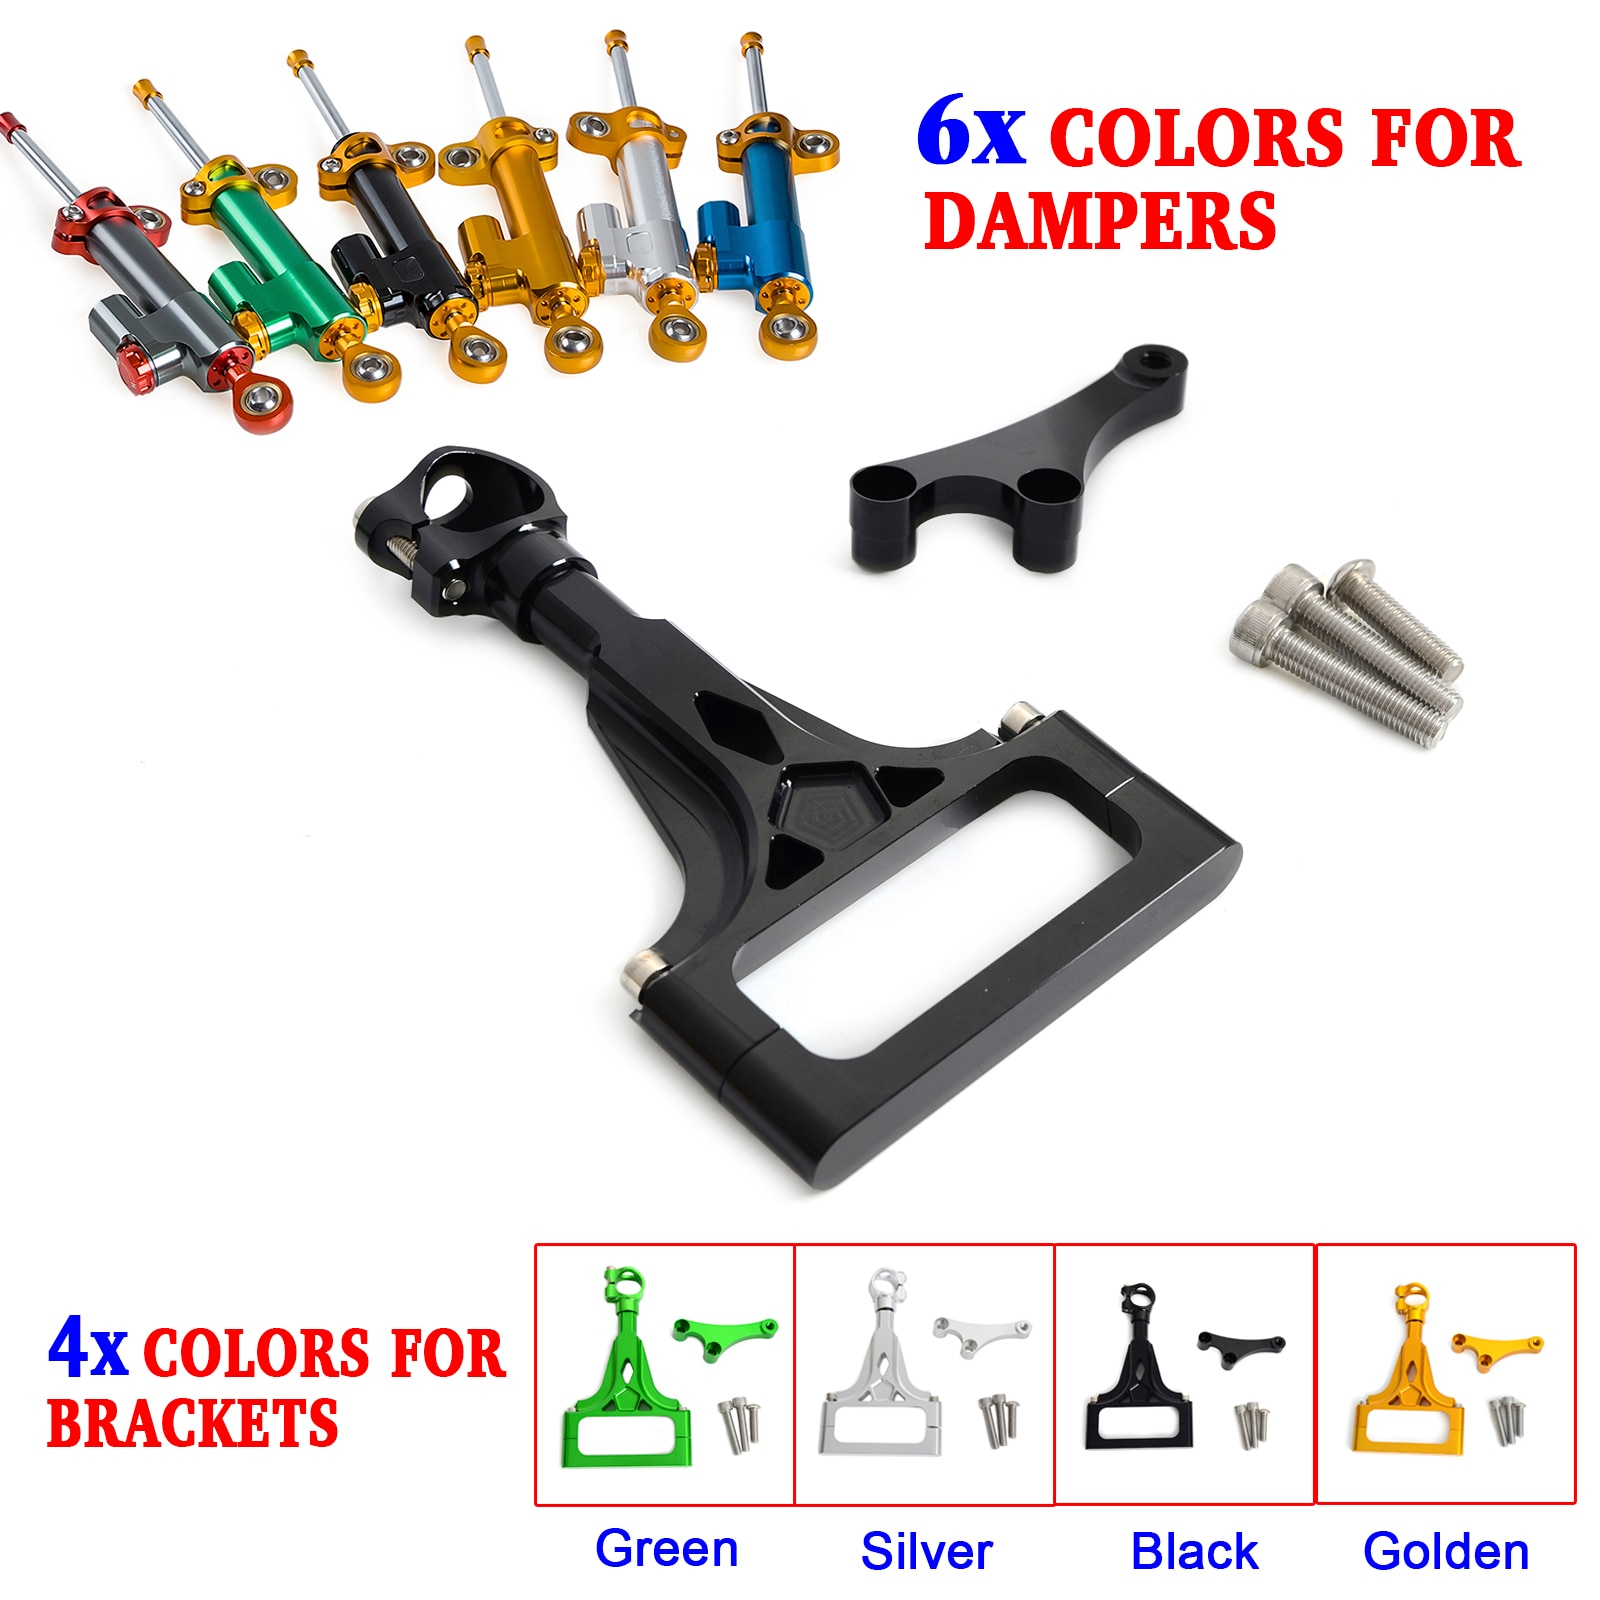 Motorcycle CNC Steering Damper Stabilizer & Bracket Mounting Kit for Kawasaki Z750 2003-2012 Z750R 2011 2012 Z1000 2003-2009